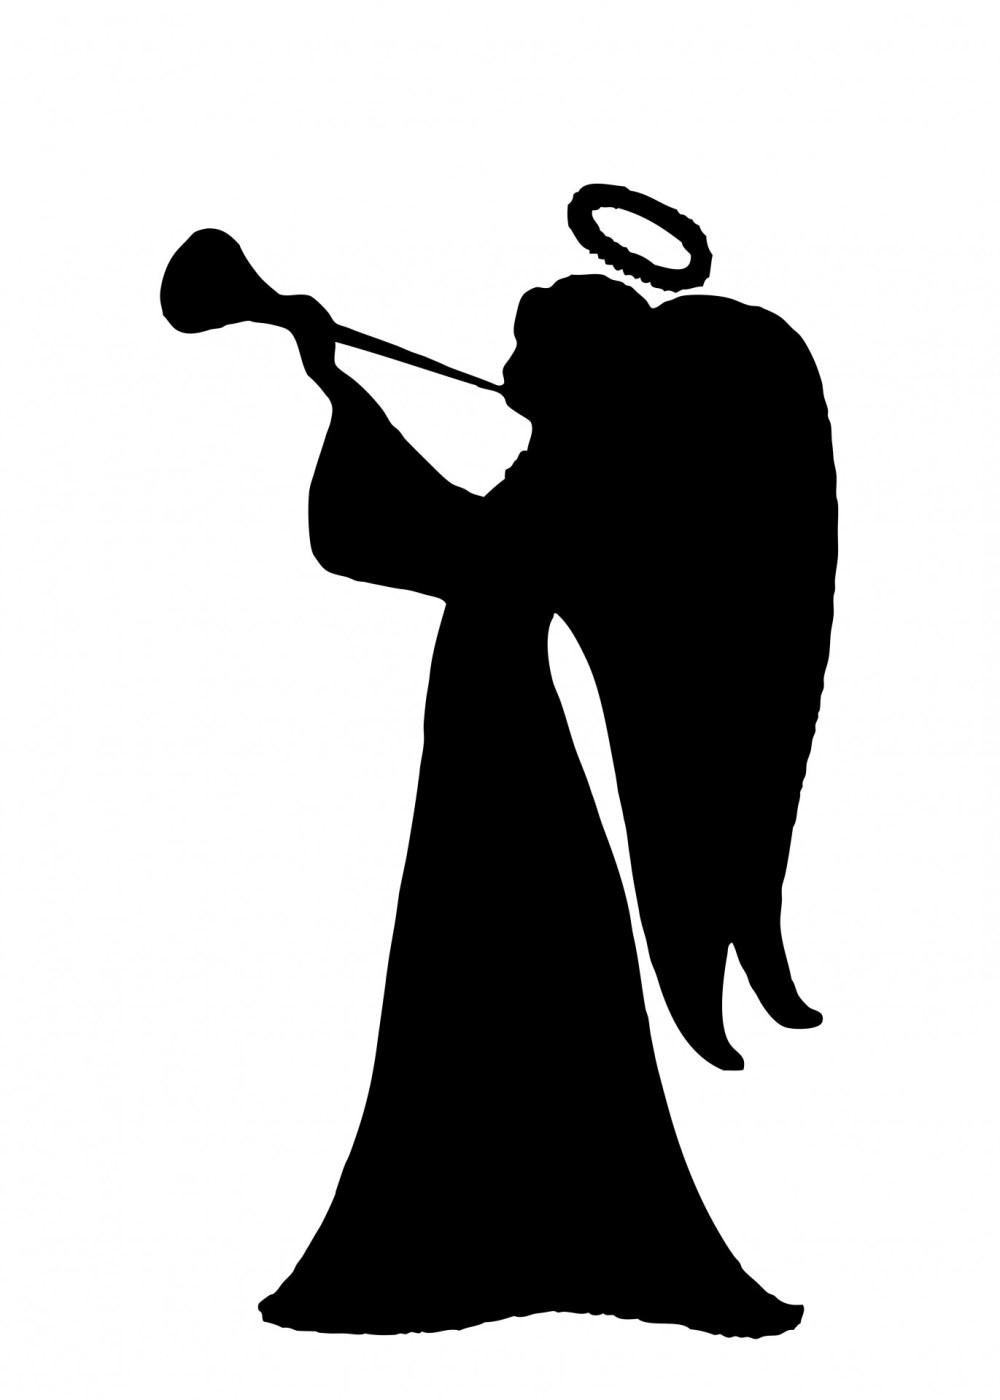 medium resolution of 1371x1920 angel silhouette clipart free stock photo